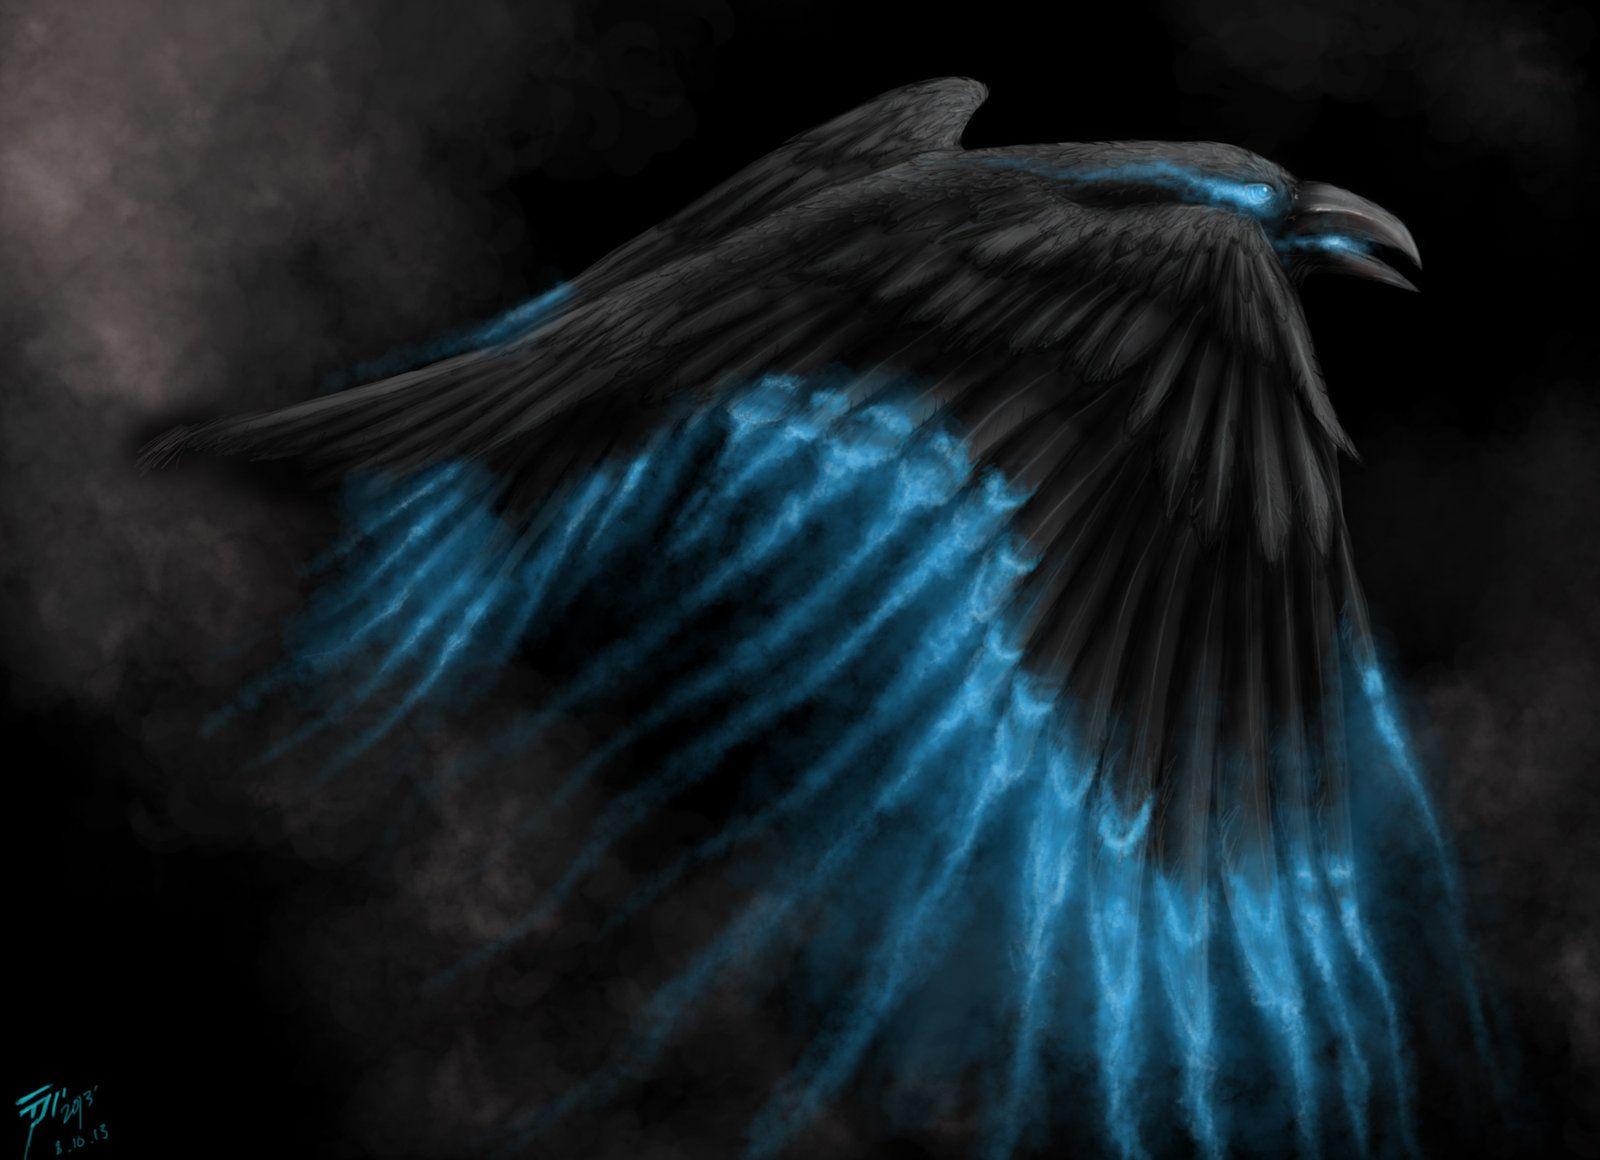 Raven Bird raven looking left bird hd widescreen